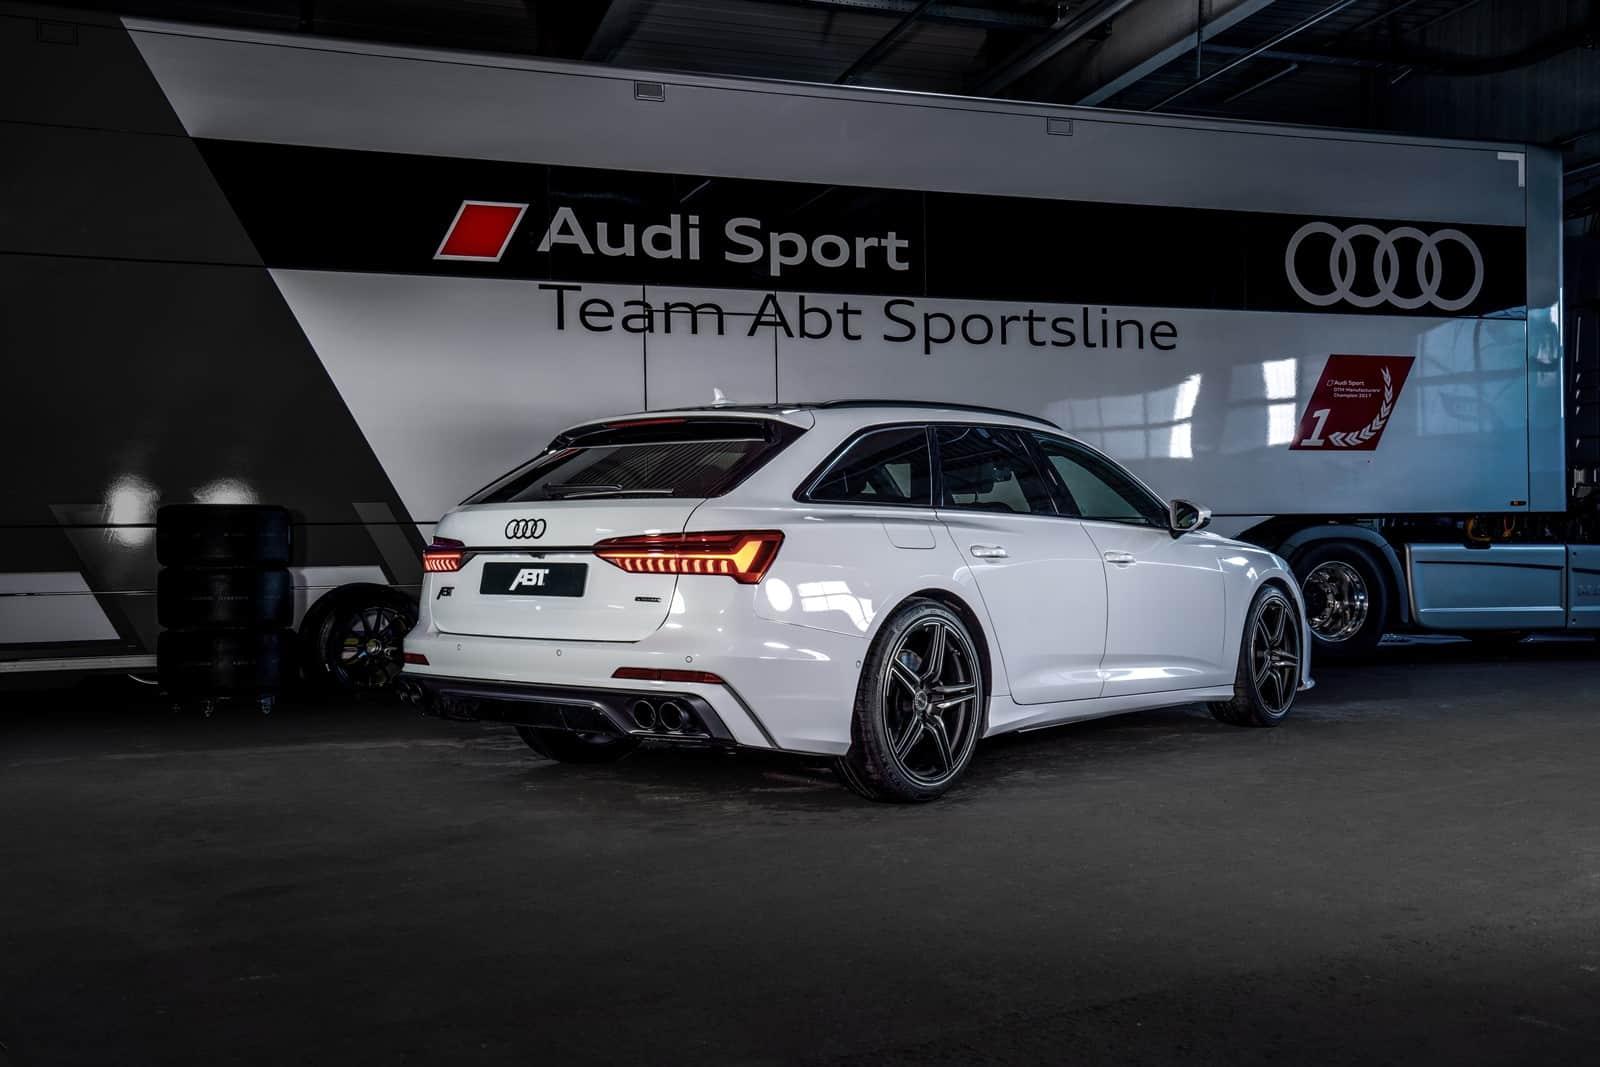 Audi-A6-Avant-ABT-aero-package-9.jpg